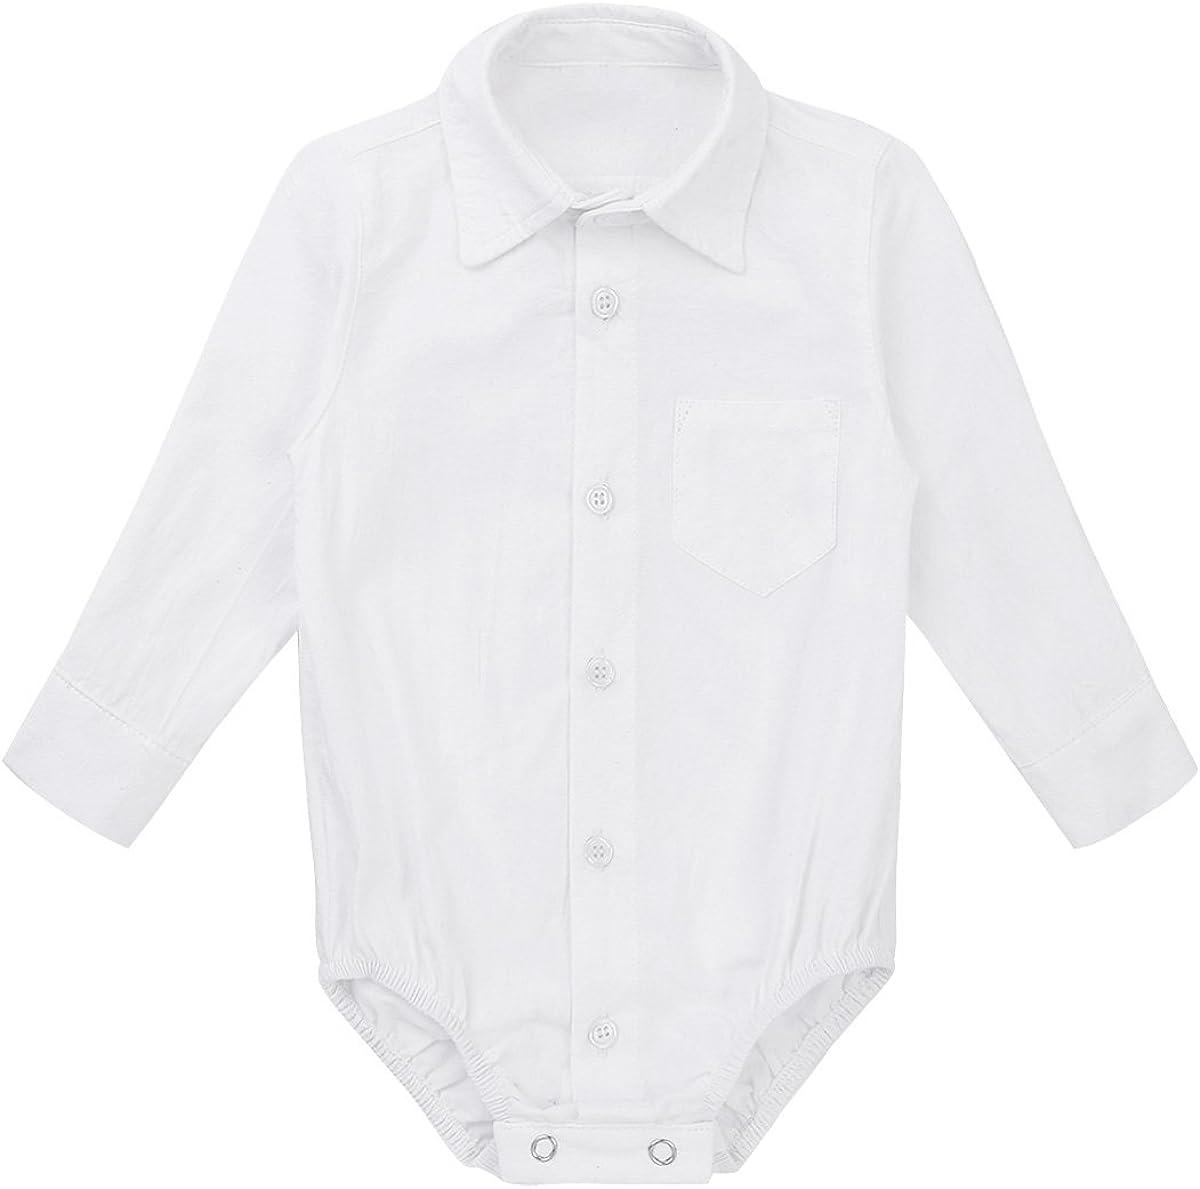 Freebily Infant Baby Boy Long//Short Sleeve Formal Dress Shirt Toddler Romper Bodysuit Wedding Baptism Outfits